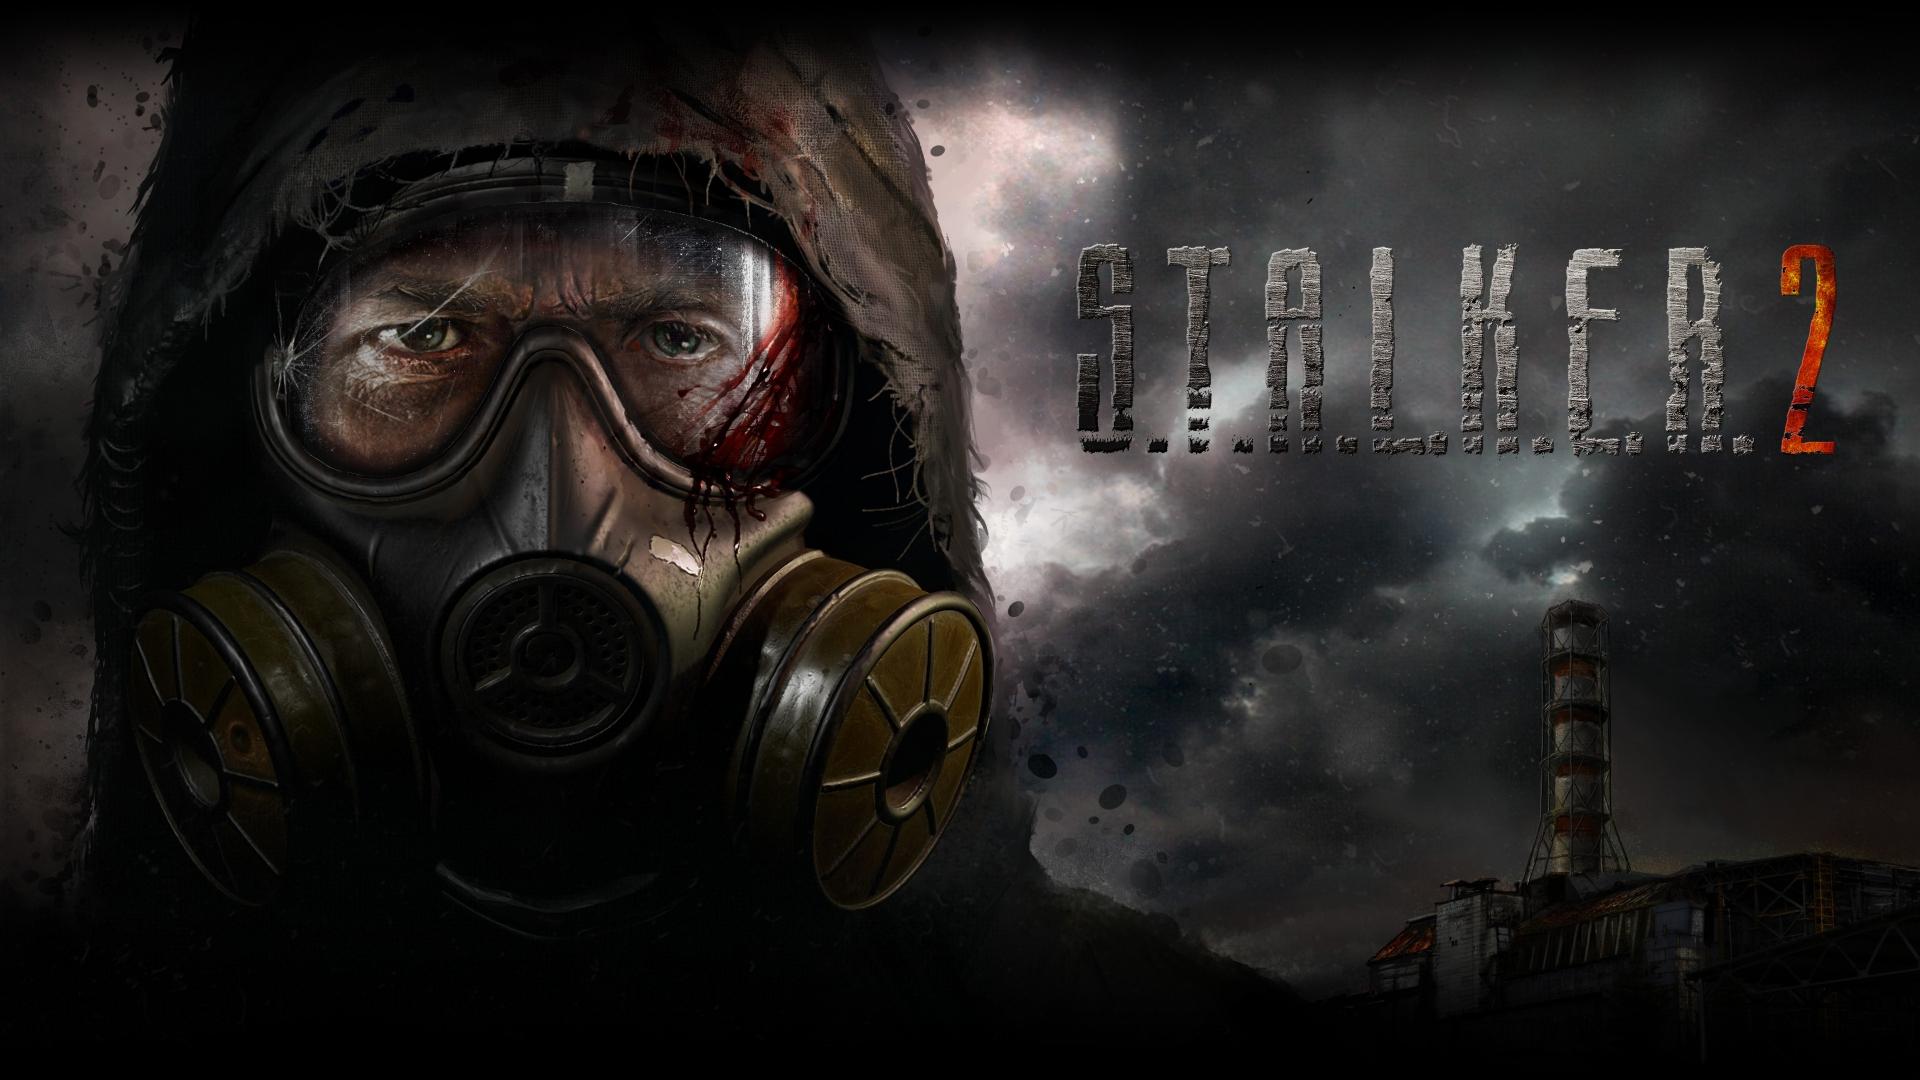 Постер S.T.A.L.K.E.R. 2